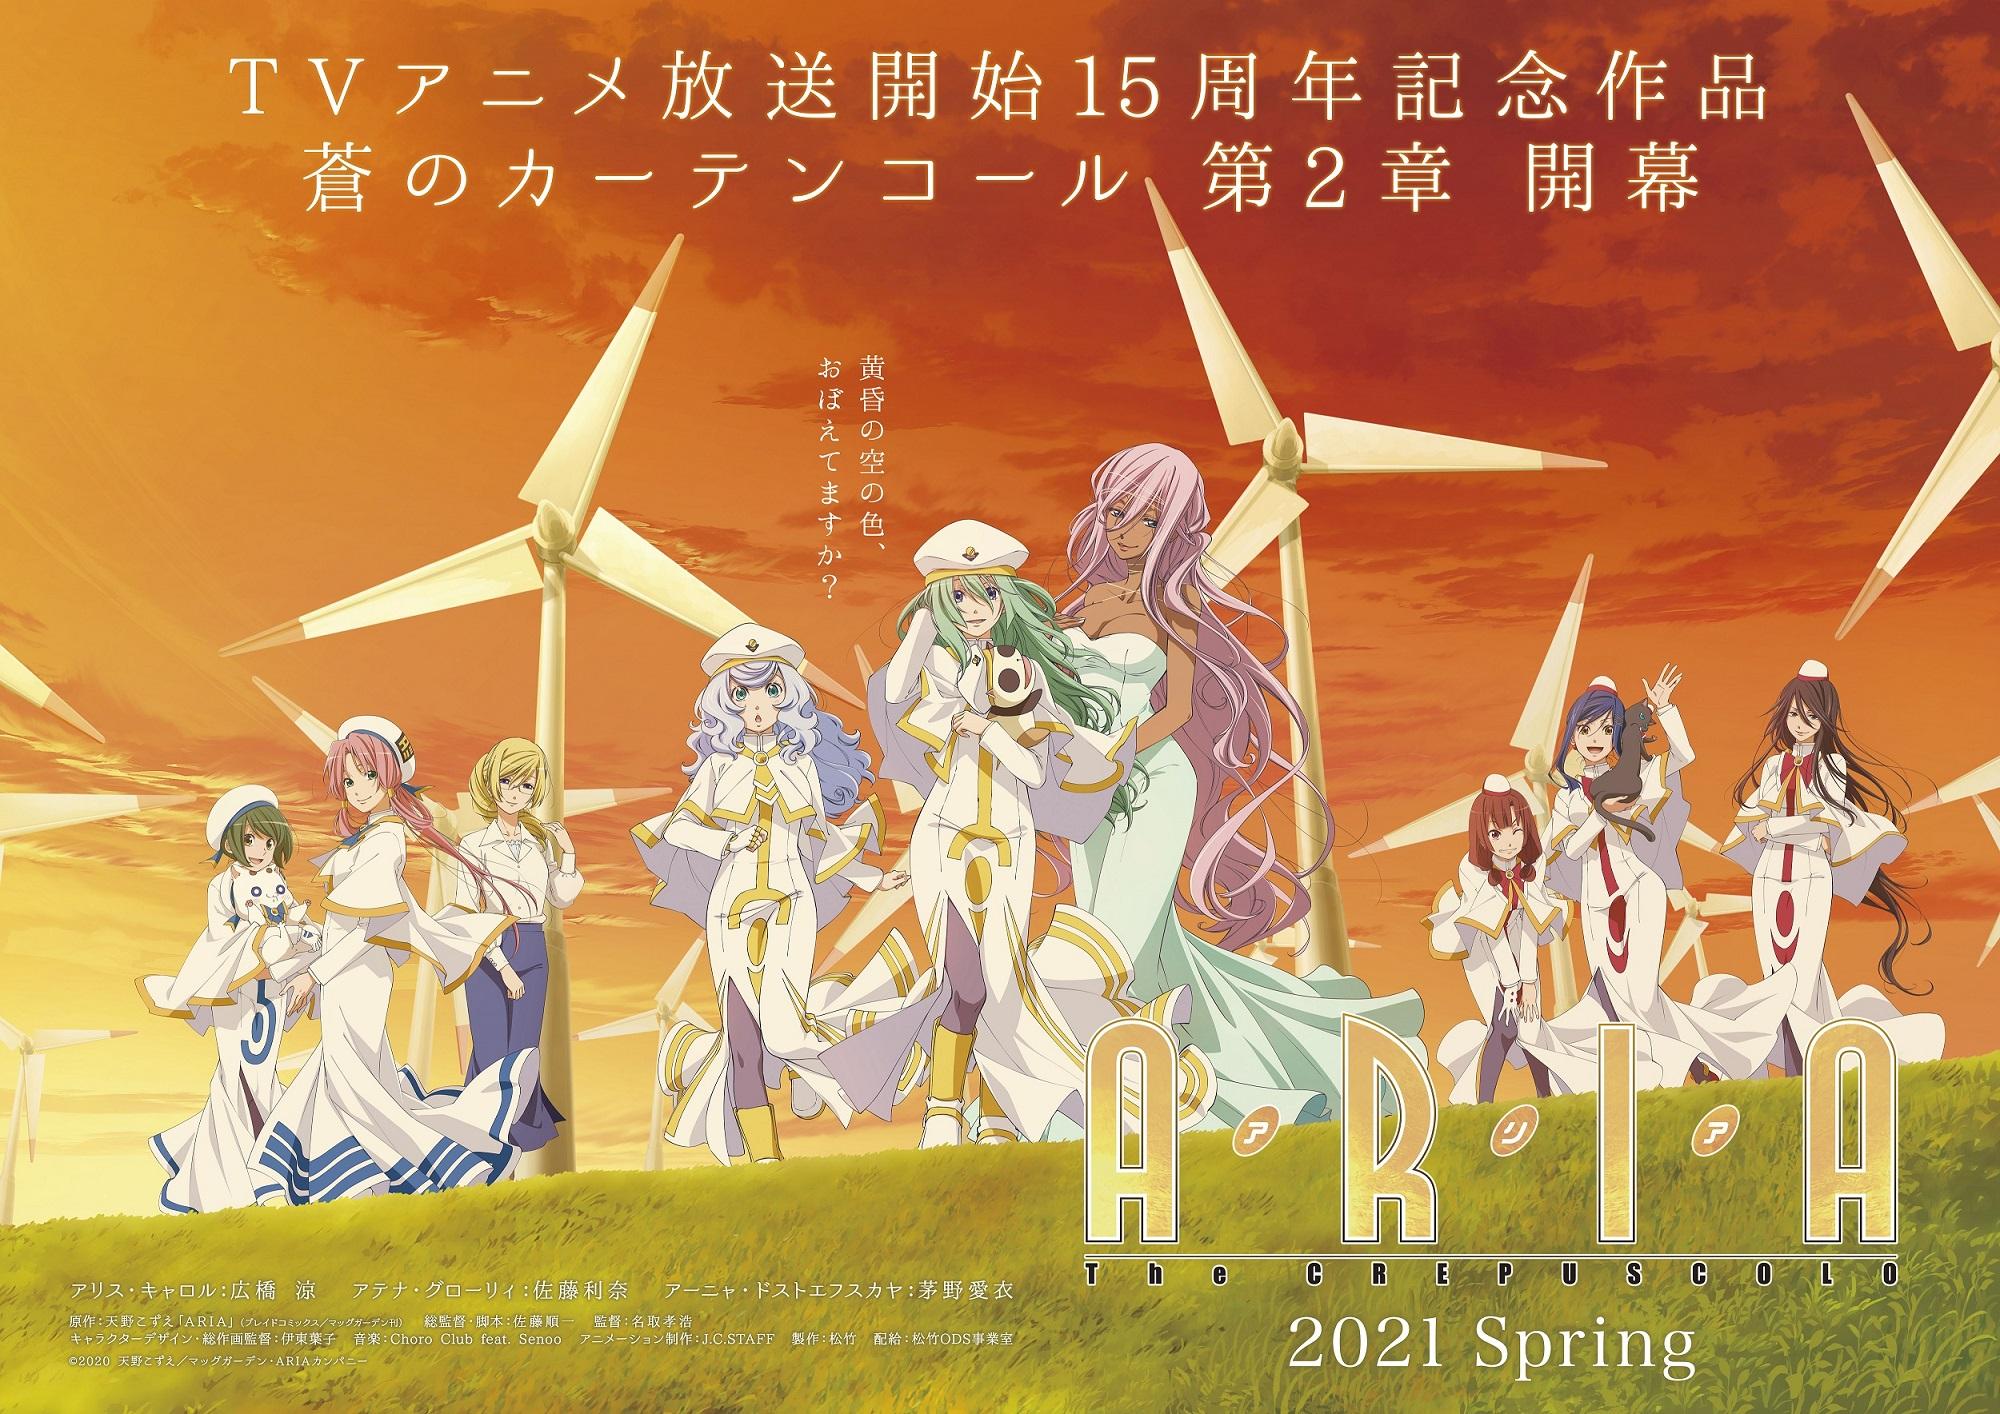 『ARIA』完全新作映画「ARIA The CREPUSCOLO」2021年春公開!ティザービジュ&特報映像解禁